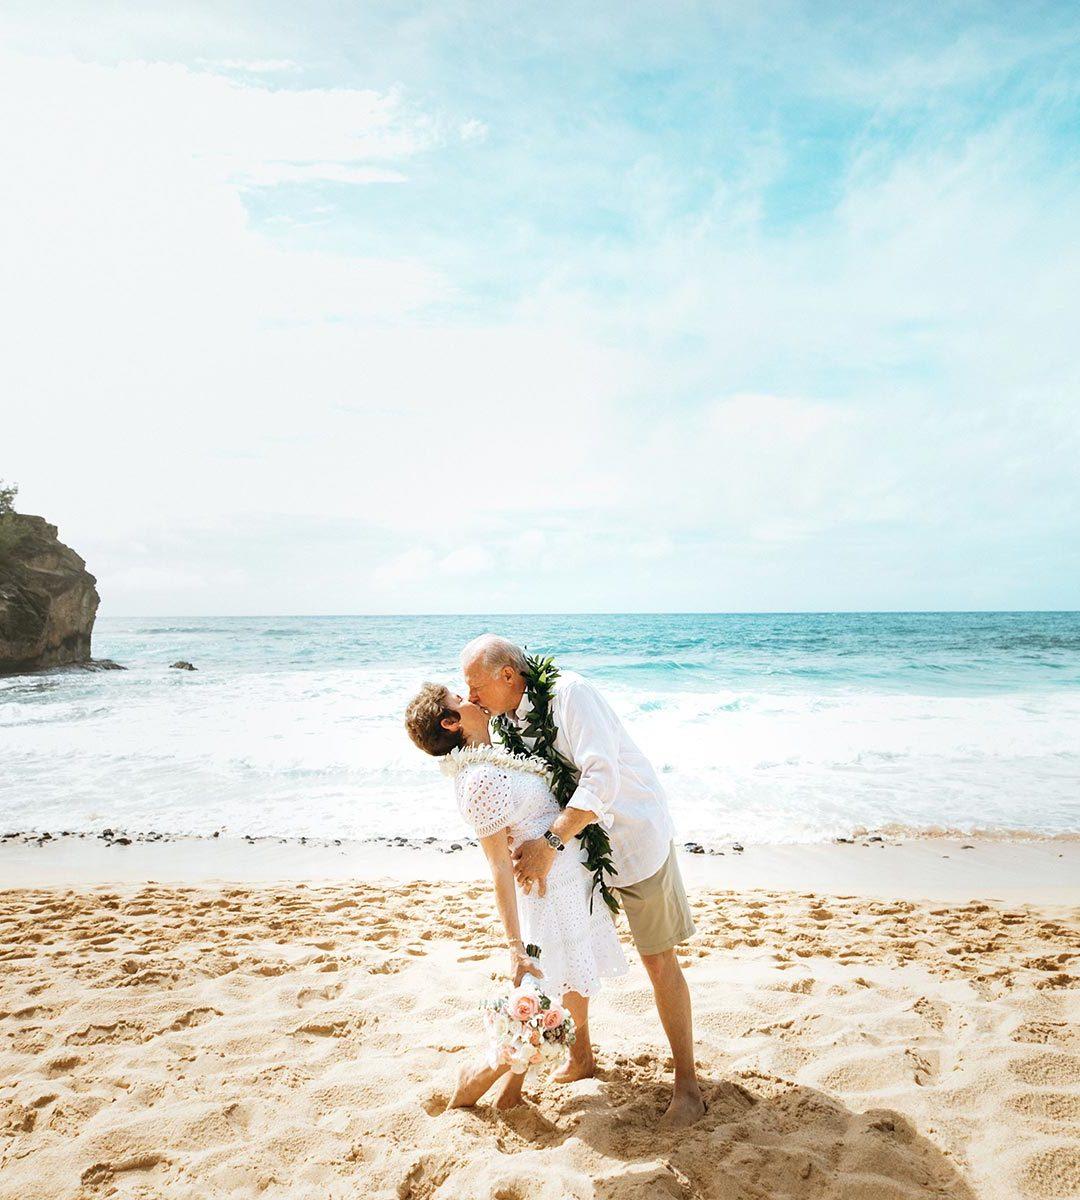 Kissing wife during vow renewal at Shipwrecks beach in Kauai.